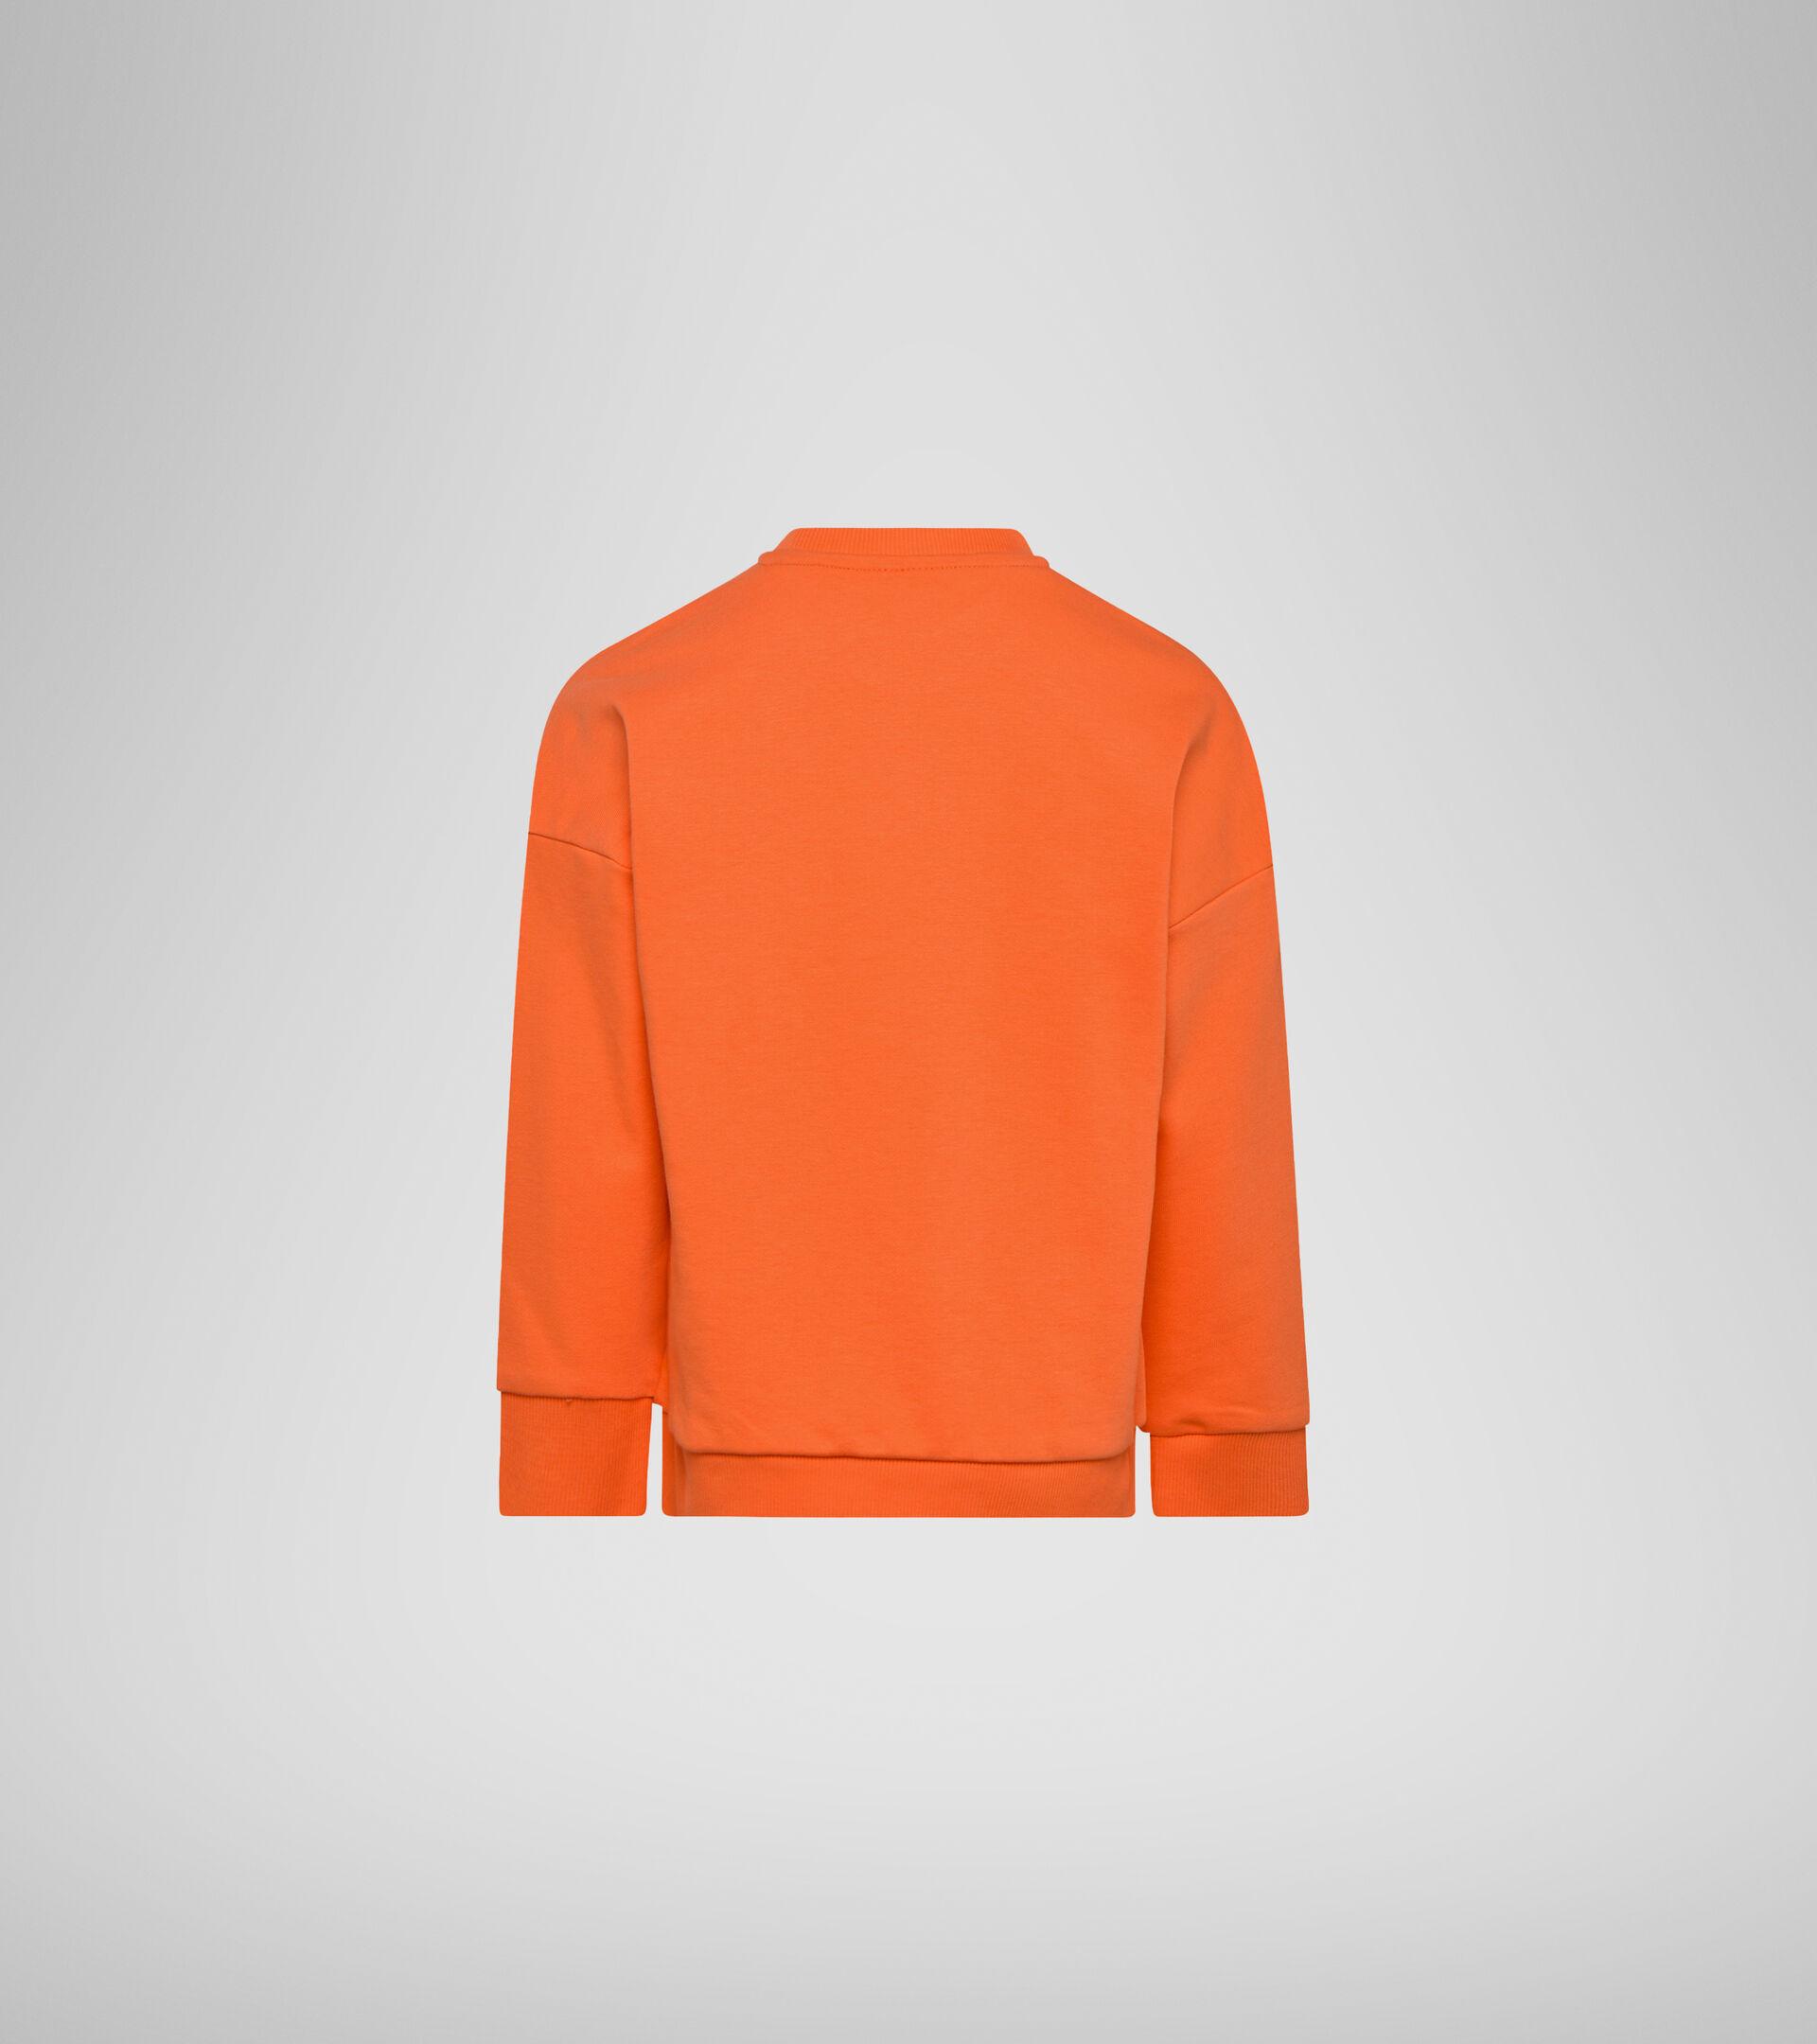 Crew-neck sweatshirt - Boys JB.SWEATSHIRT CREW DIADORA CLUB ORANGE NASTURTIUM - Diadora